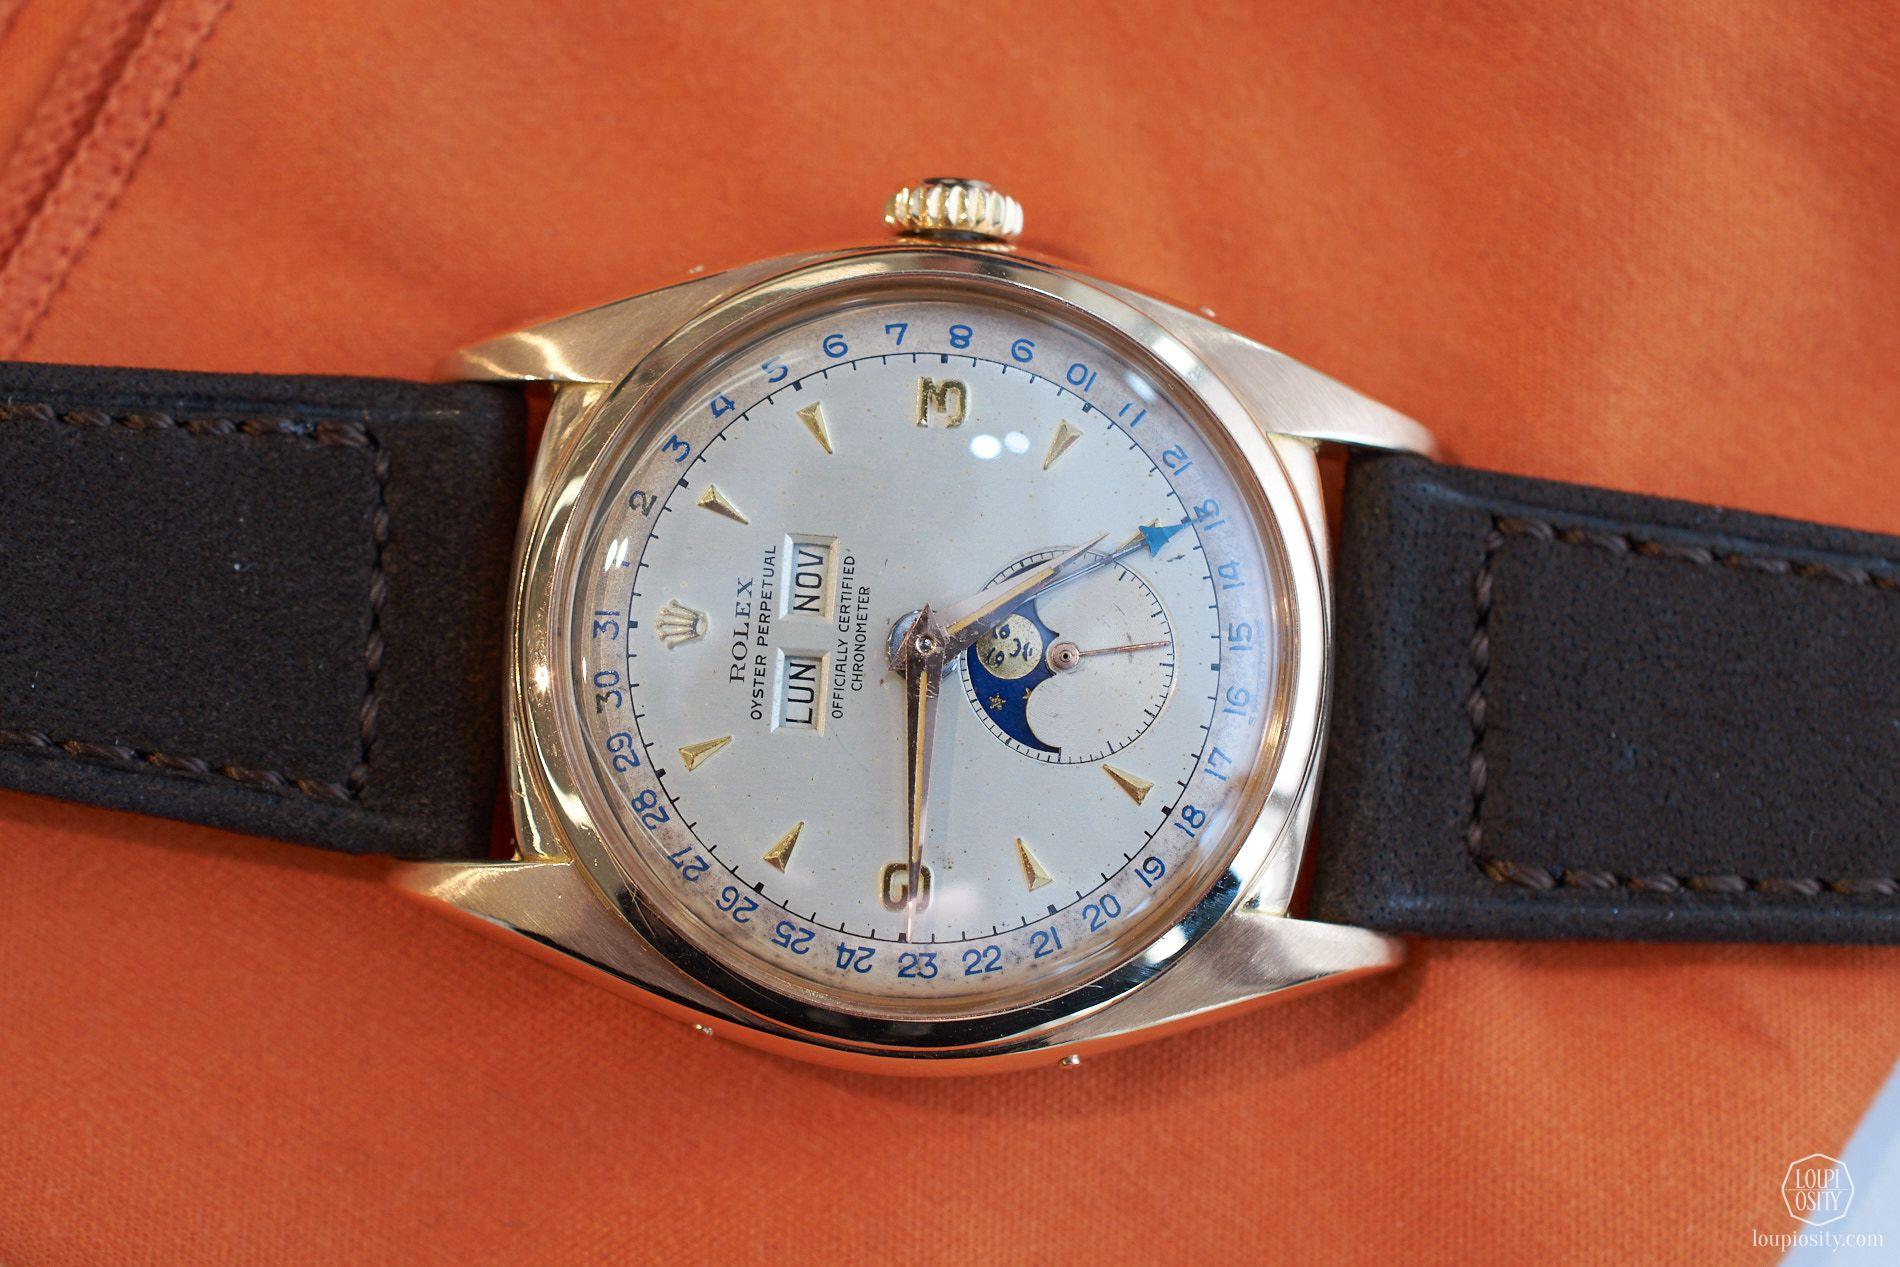 Phillips Geneva Watch Auction: Six - Loupiosity com